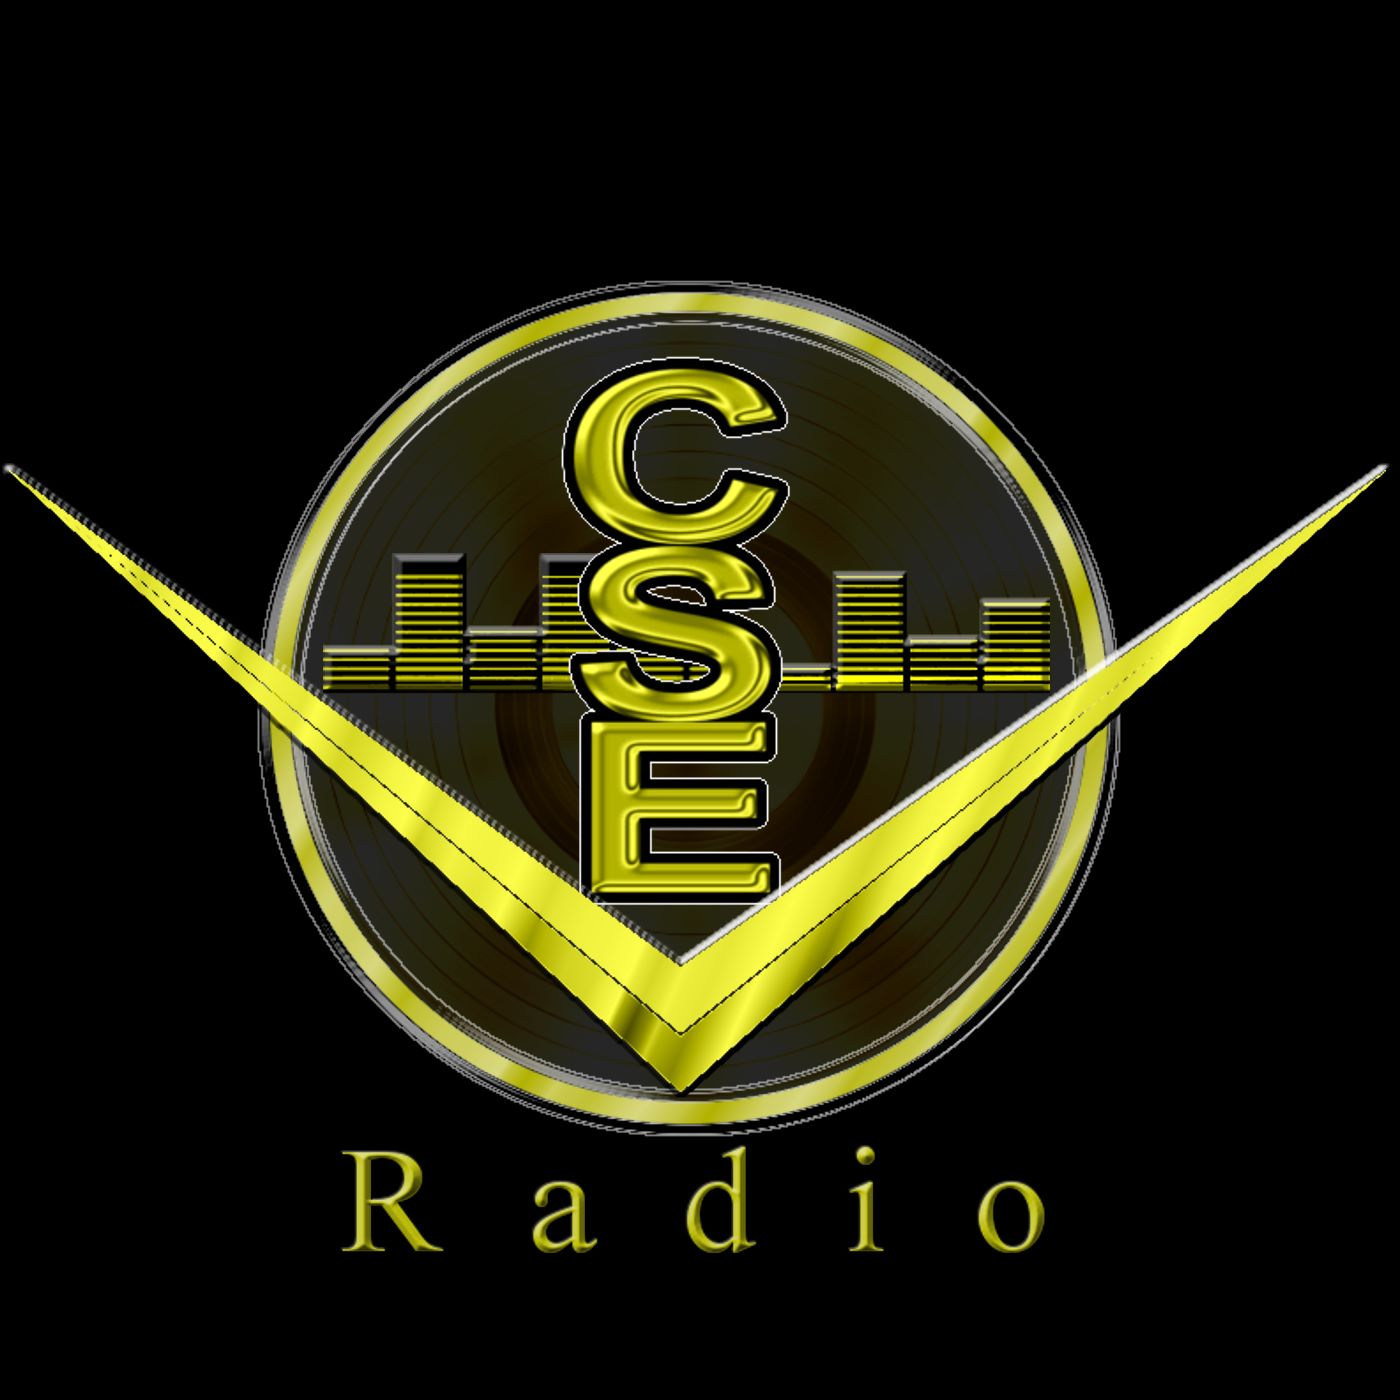 CSE Radio